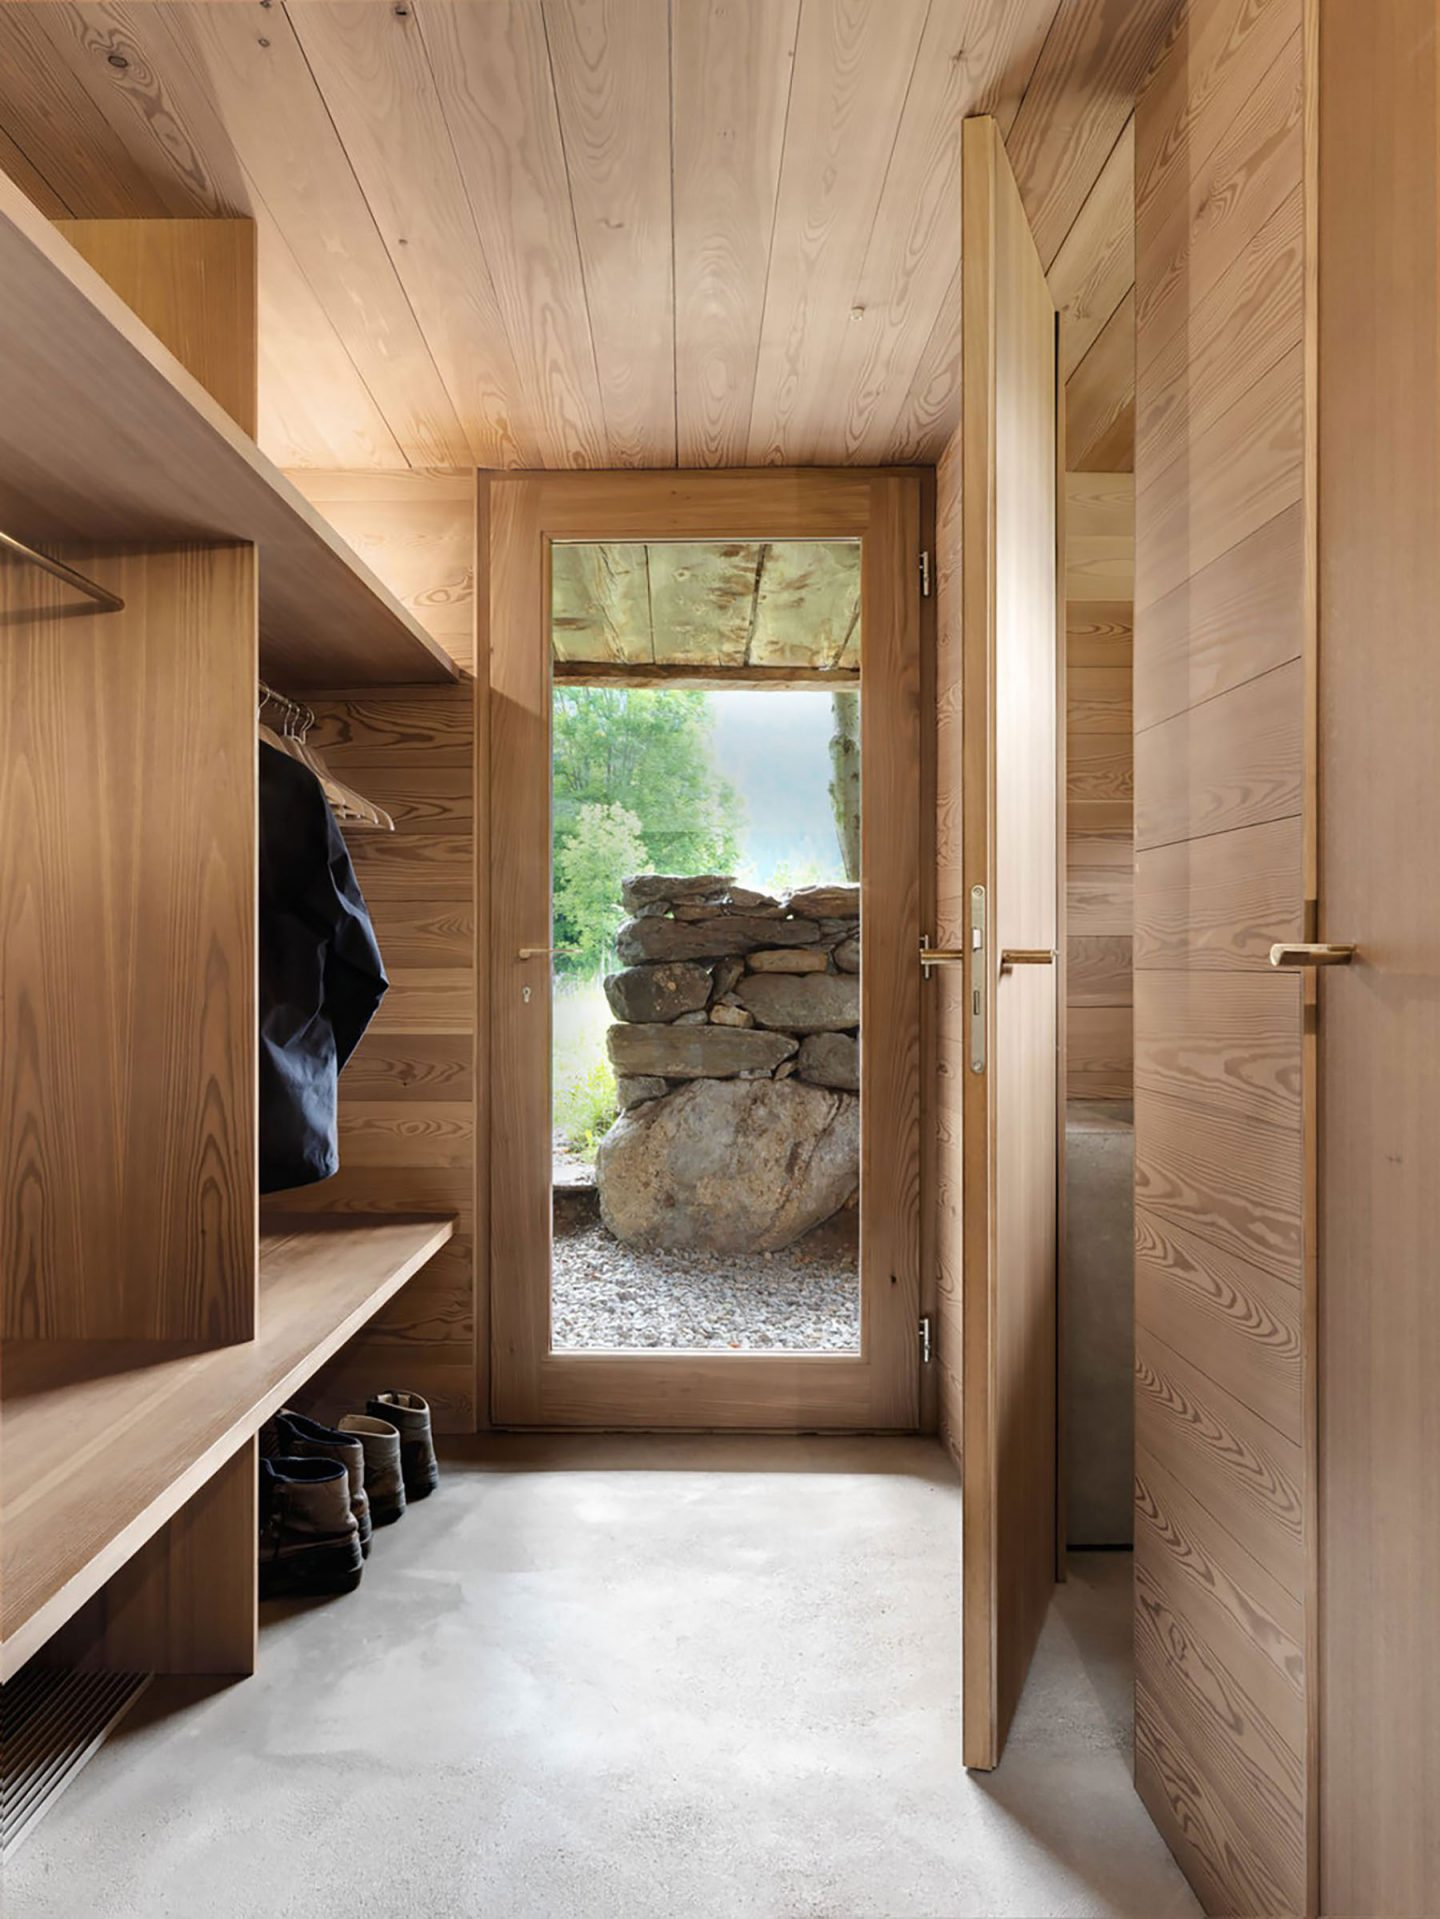 iGNANT-Architecture-Rapin-Saiz-Sarreyer-Cabin-03